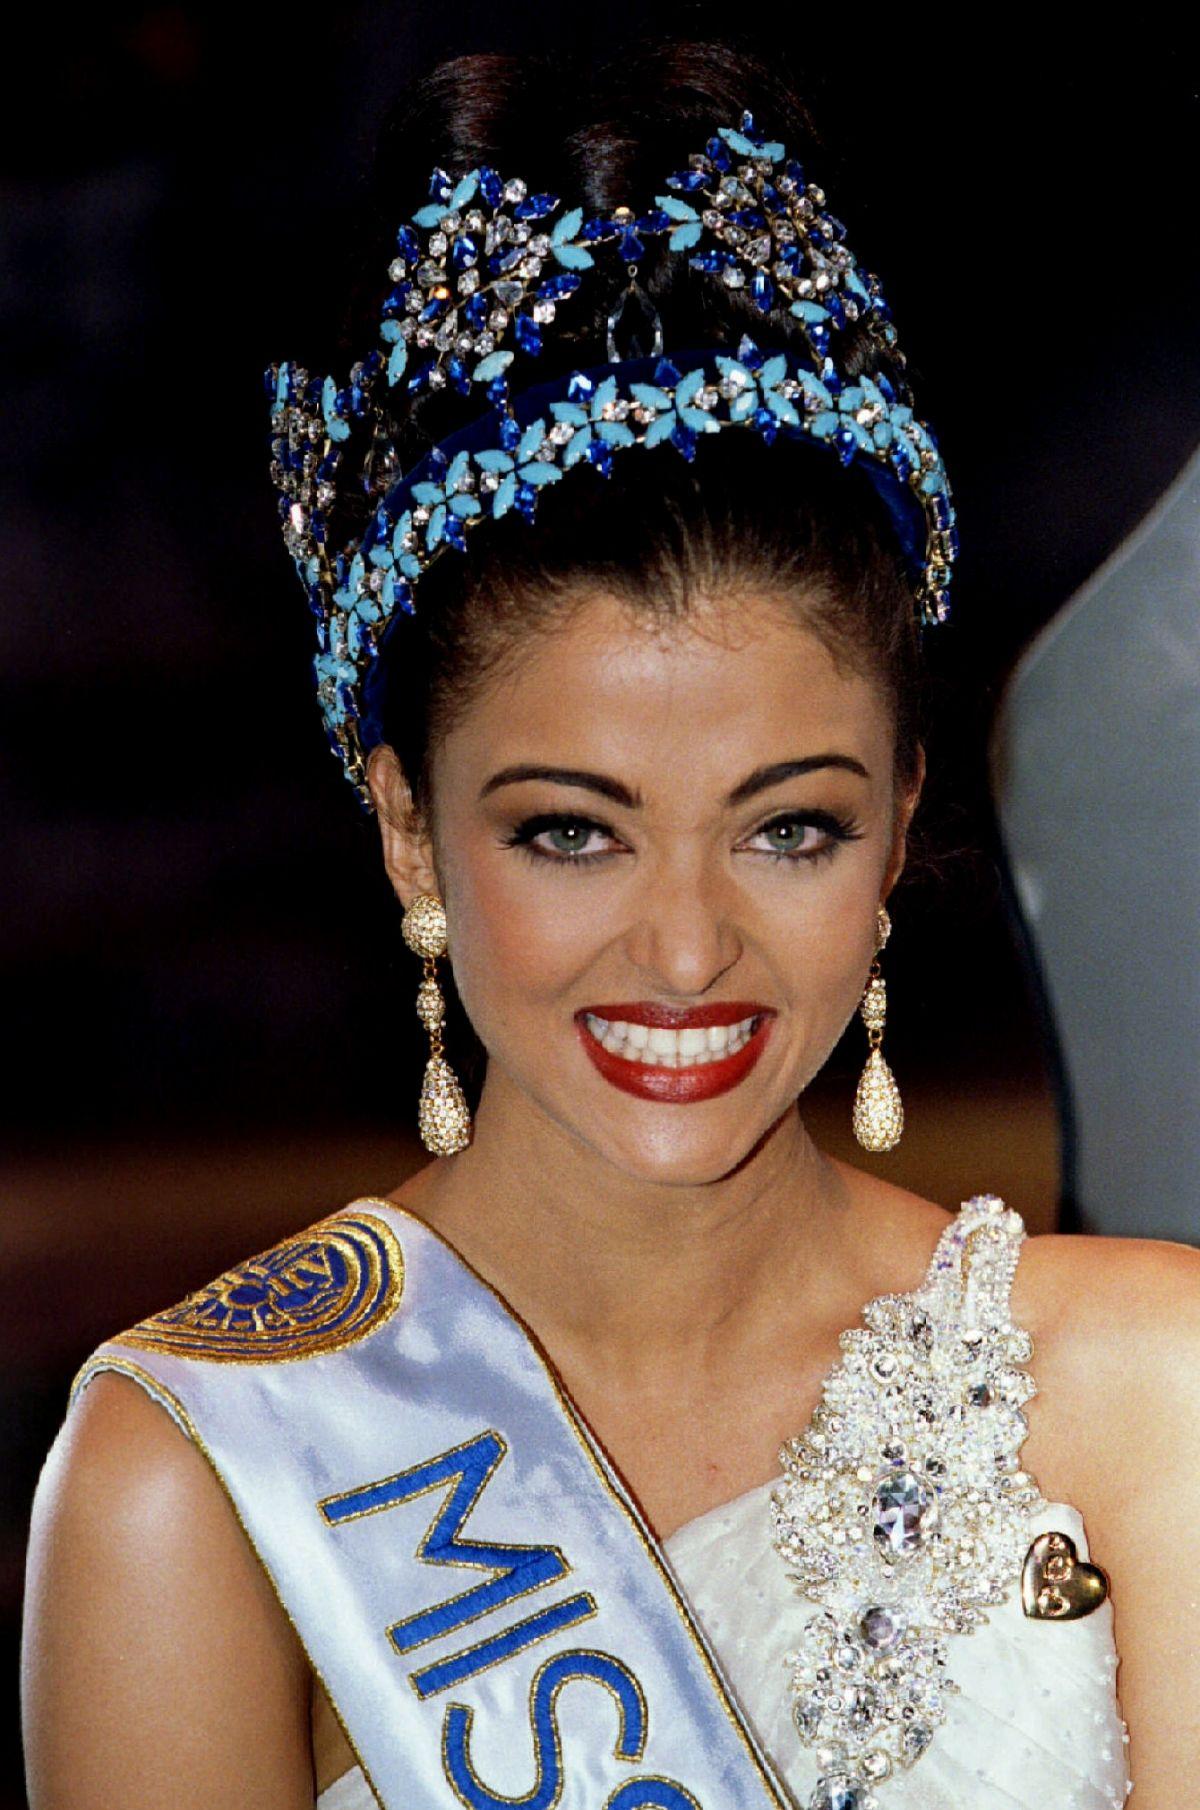 Aishwarya Rai Bachchan: 20 years of winning Miss World